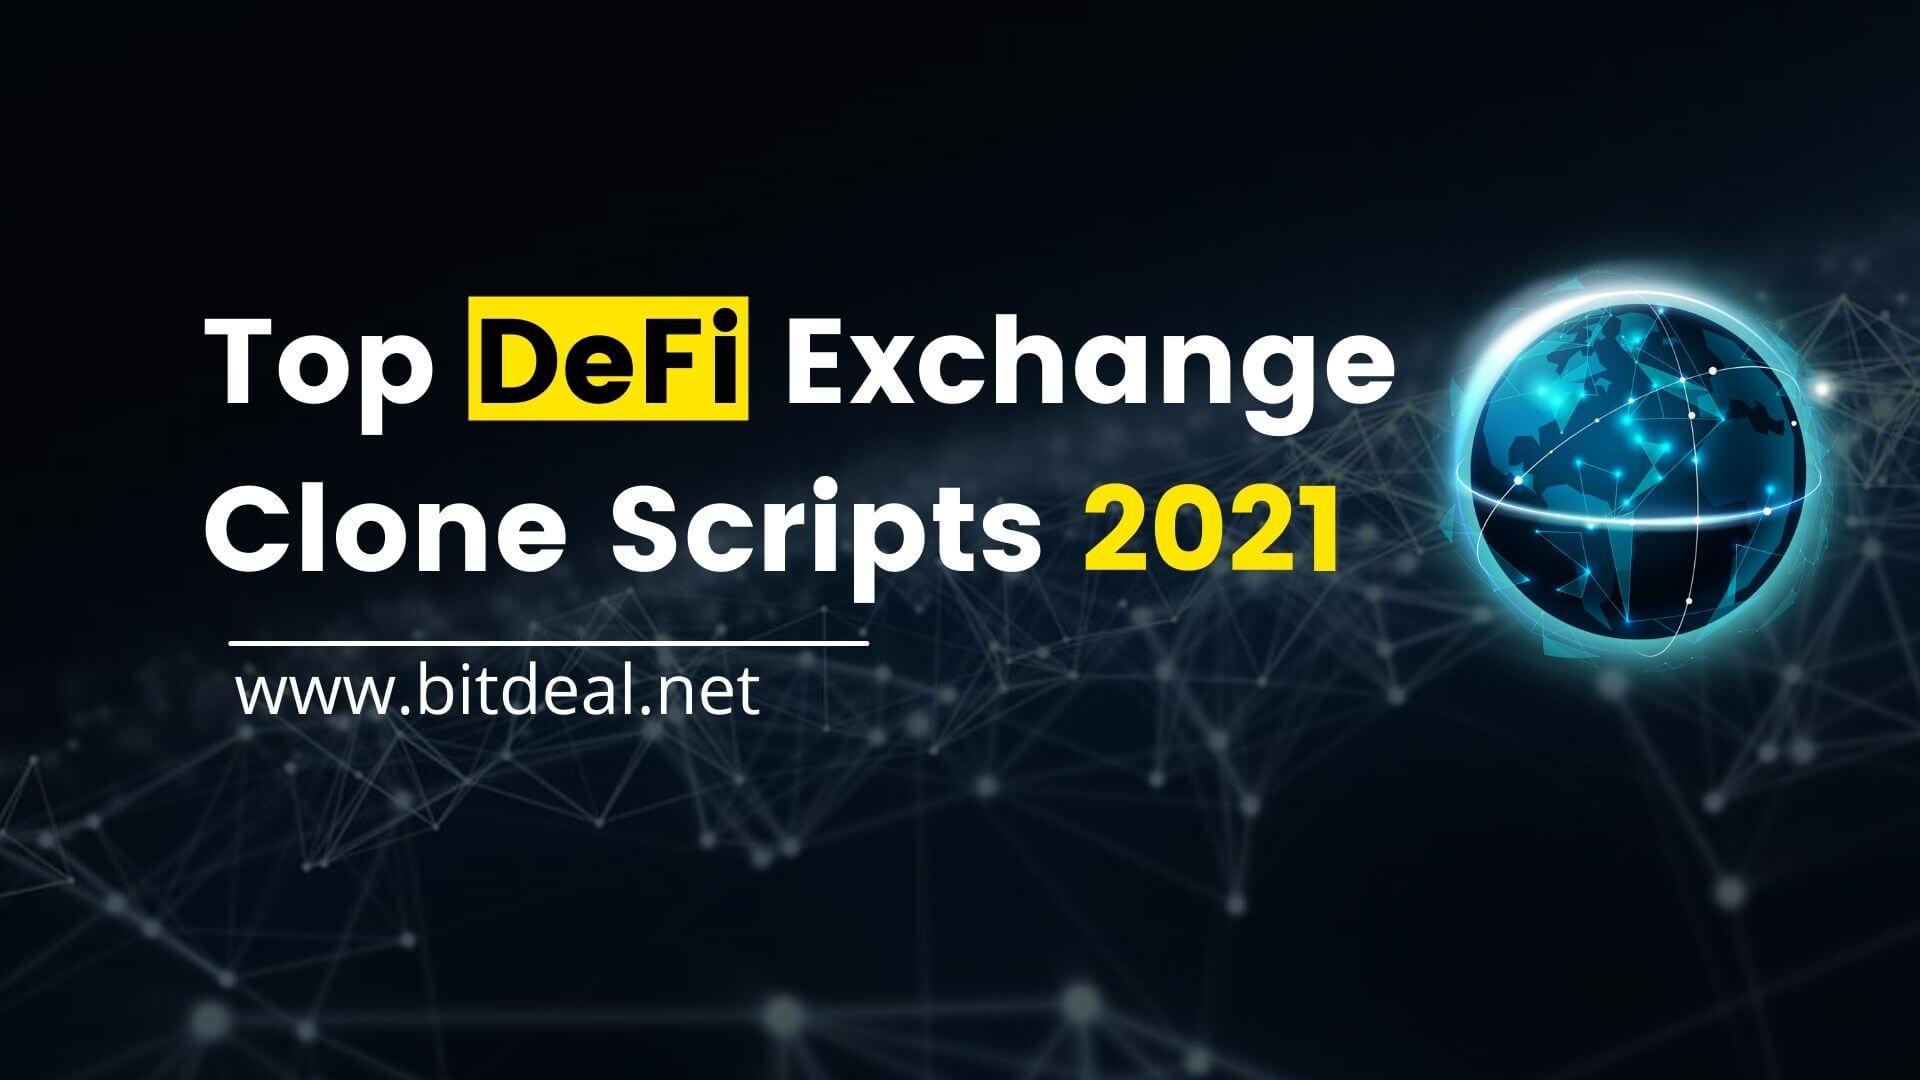 Top 10 DeFi Exchange Clone Scripts to Earn Passive Income!!!